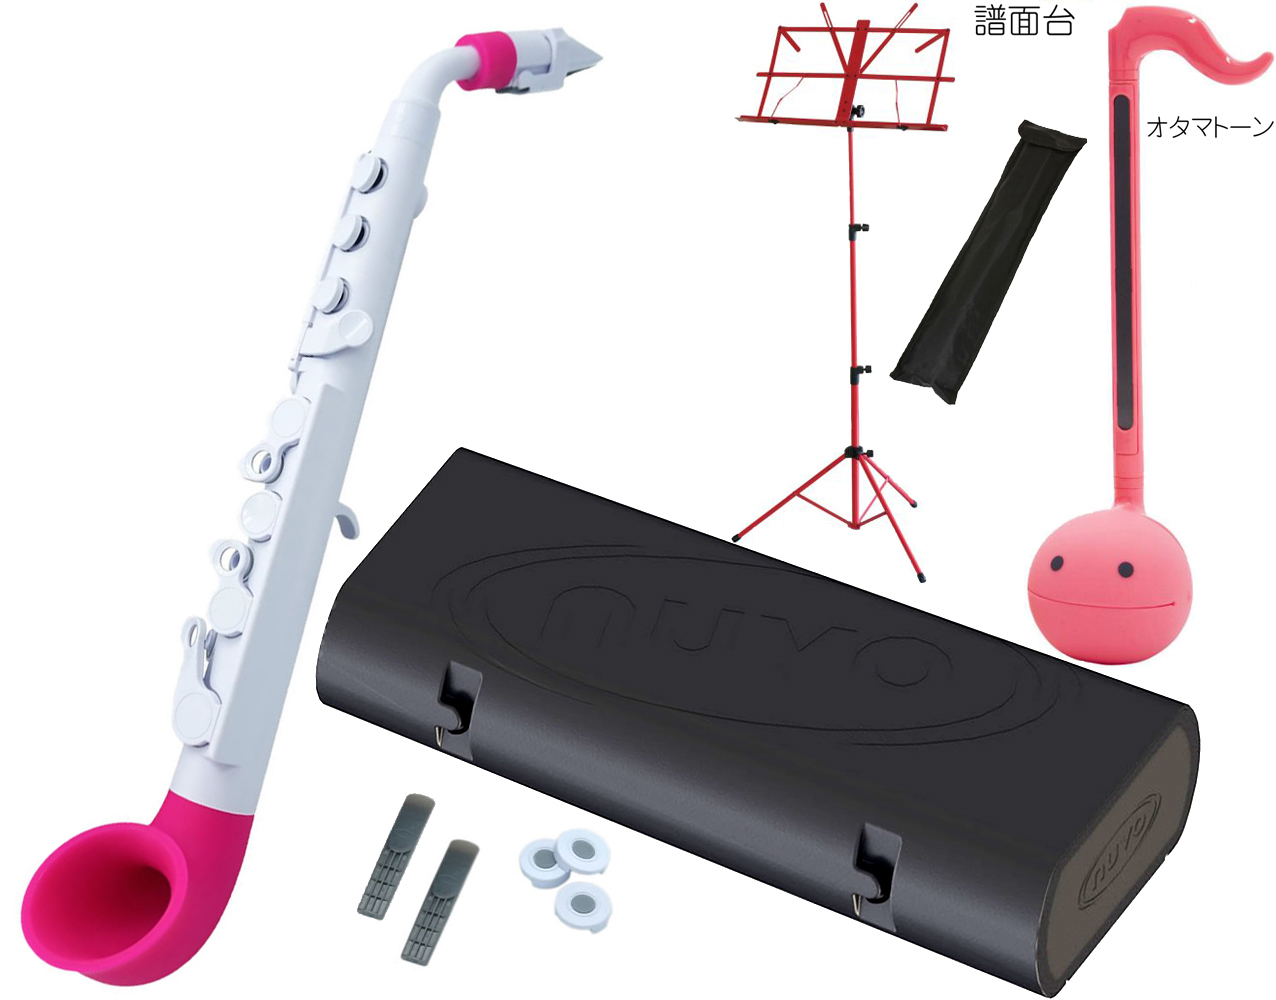 NUVO ( 送料無料 pink ヌーボ 白色 ) jSAX ホワイト ピンク N510JWPK プラスチック製 管楽器 サックス系 リード楽器 本体 サクソフォン 白色 pink【 jサックス BK/PK セット Q】 送料無料, イガシ:fcbd332d --- reifengumi.hu